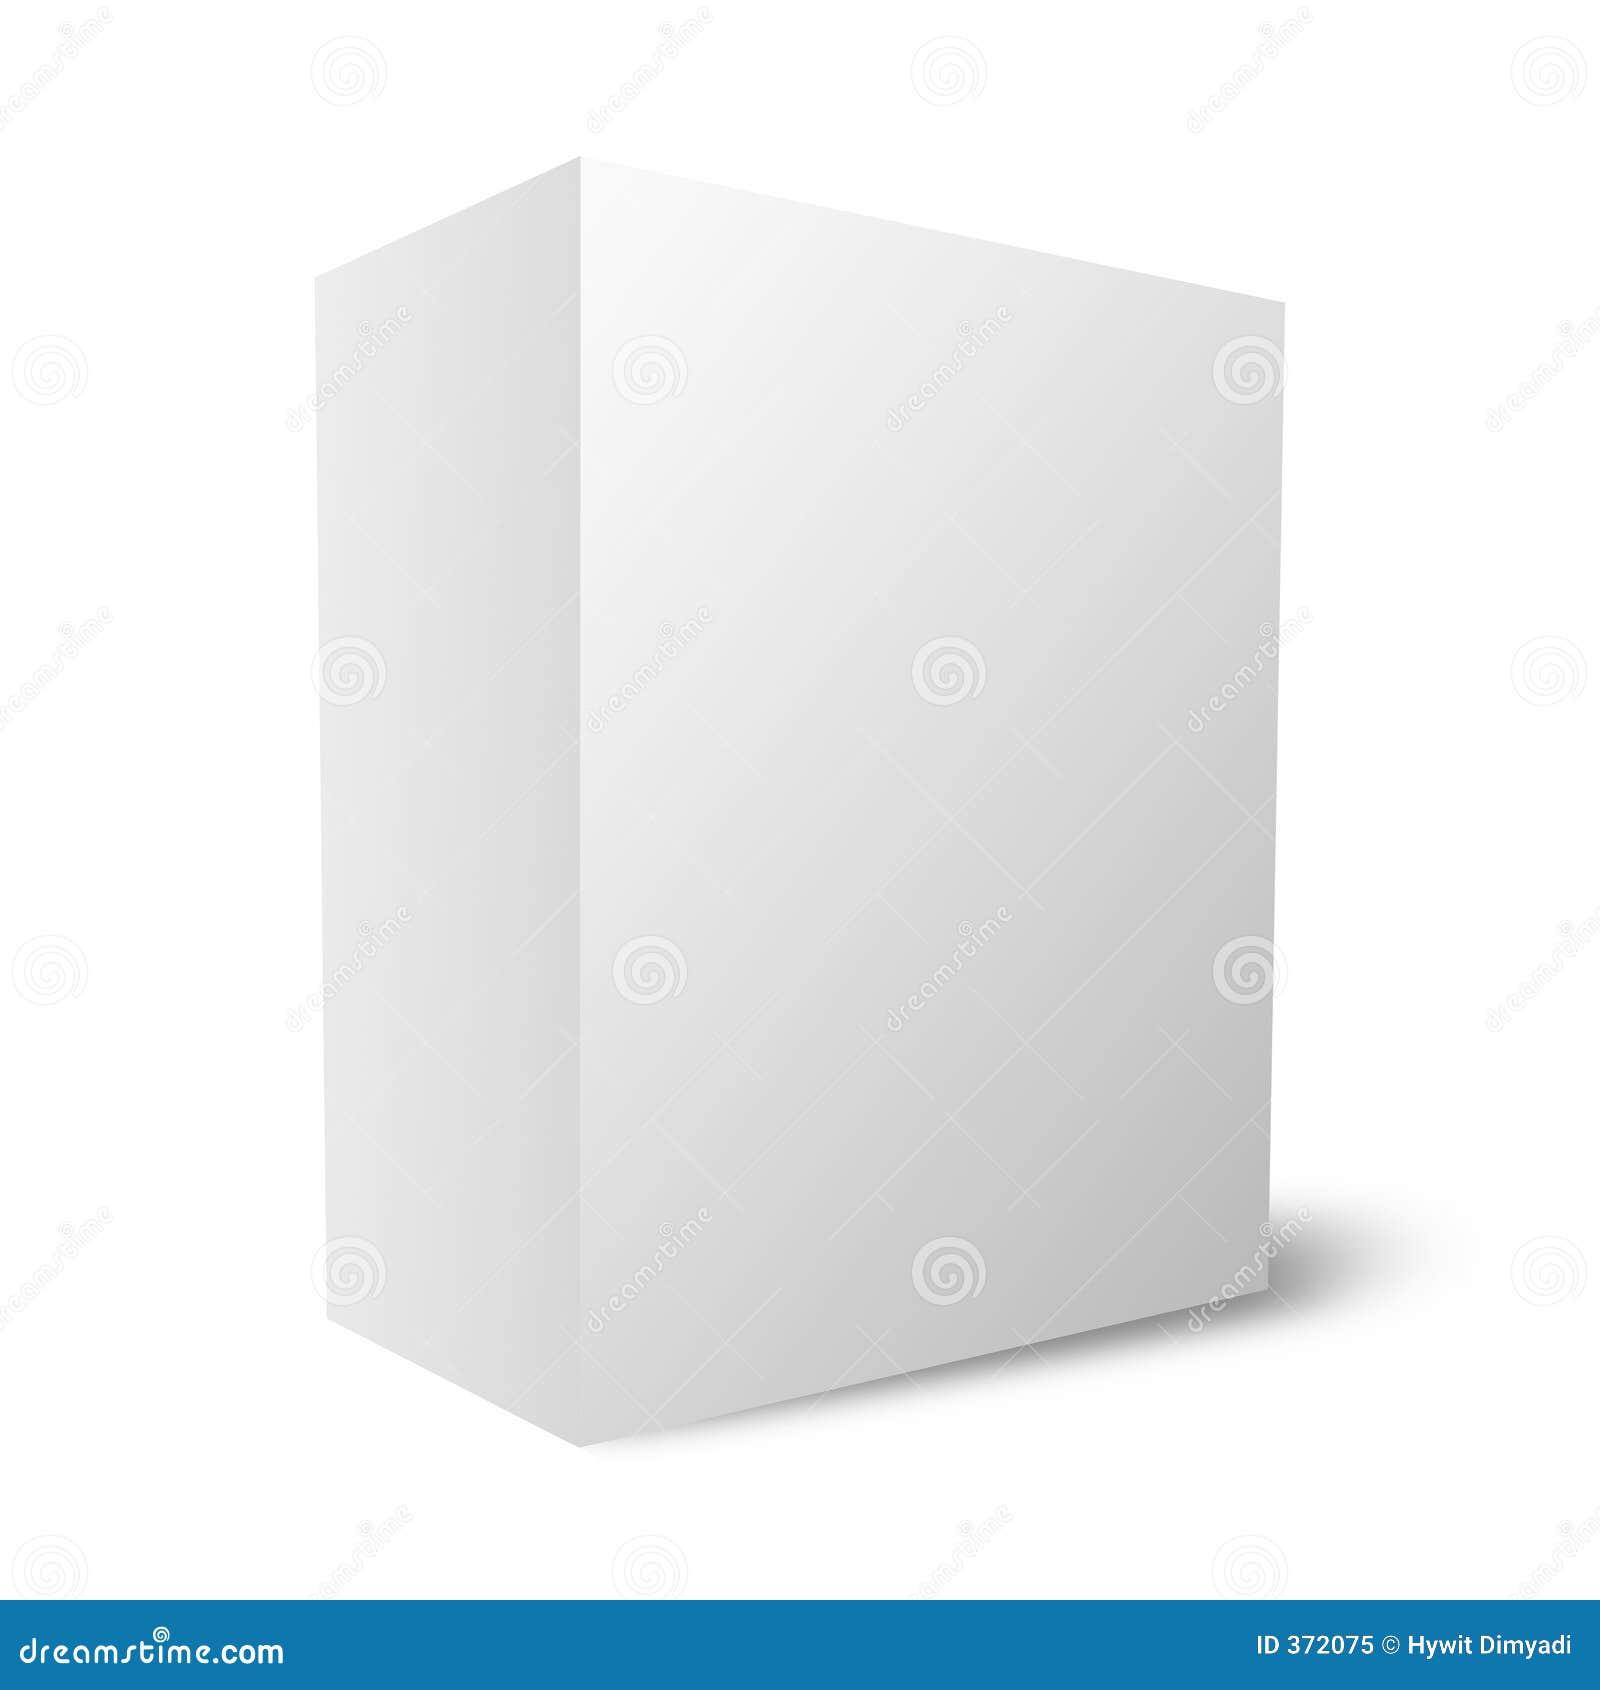 12mb ślepej pudełka jasno